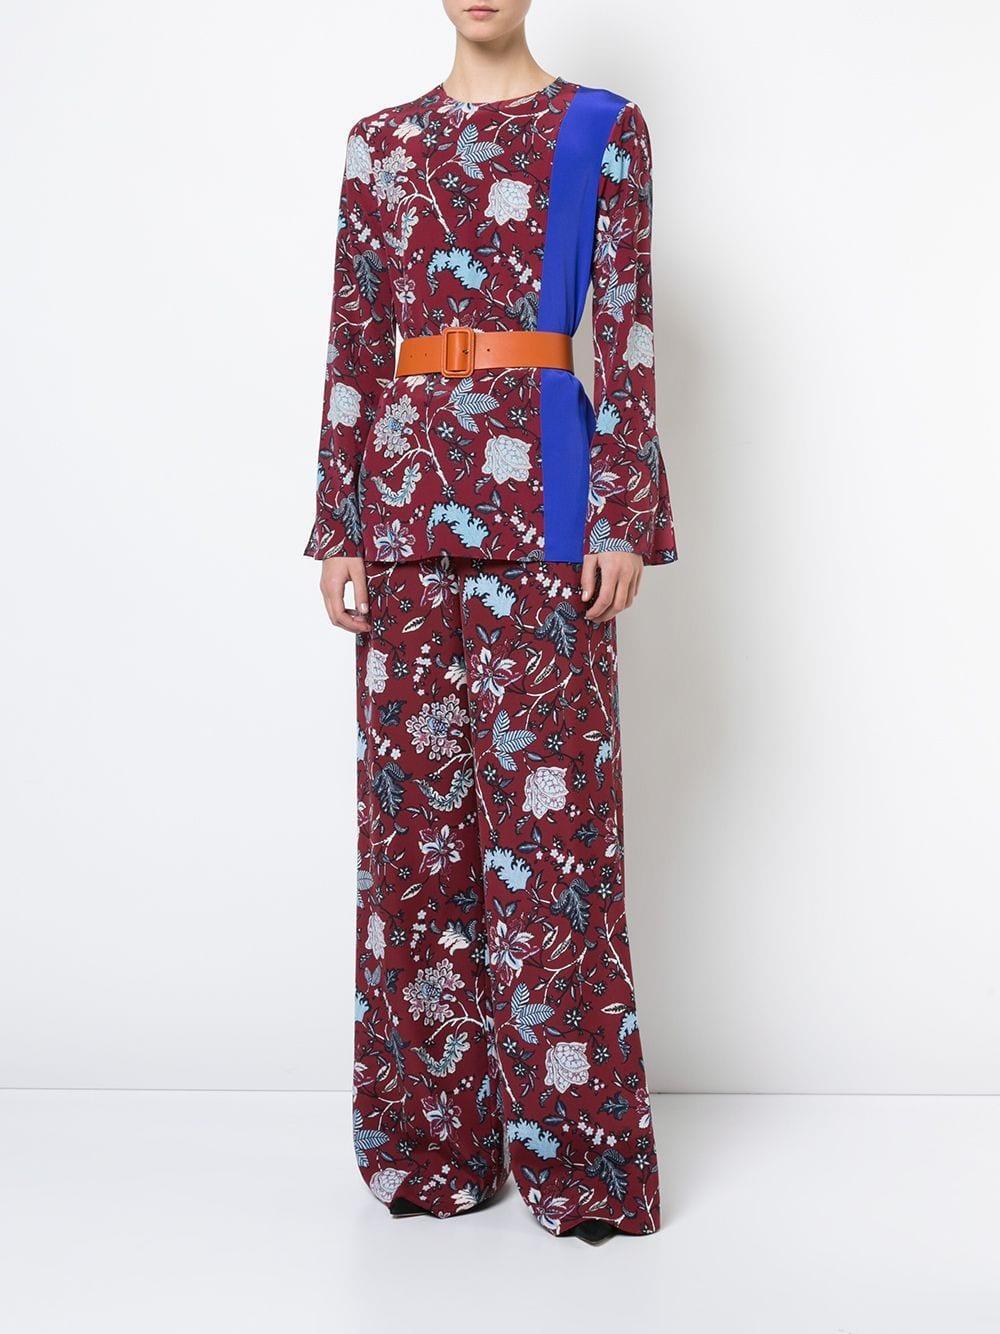 Blouse à fleurs Canton en Soie Diane von Furstenberg